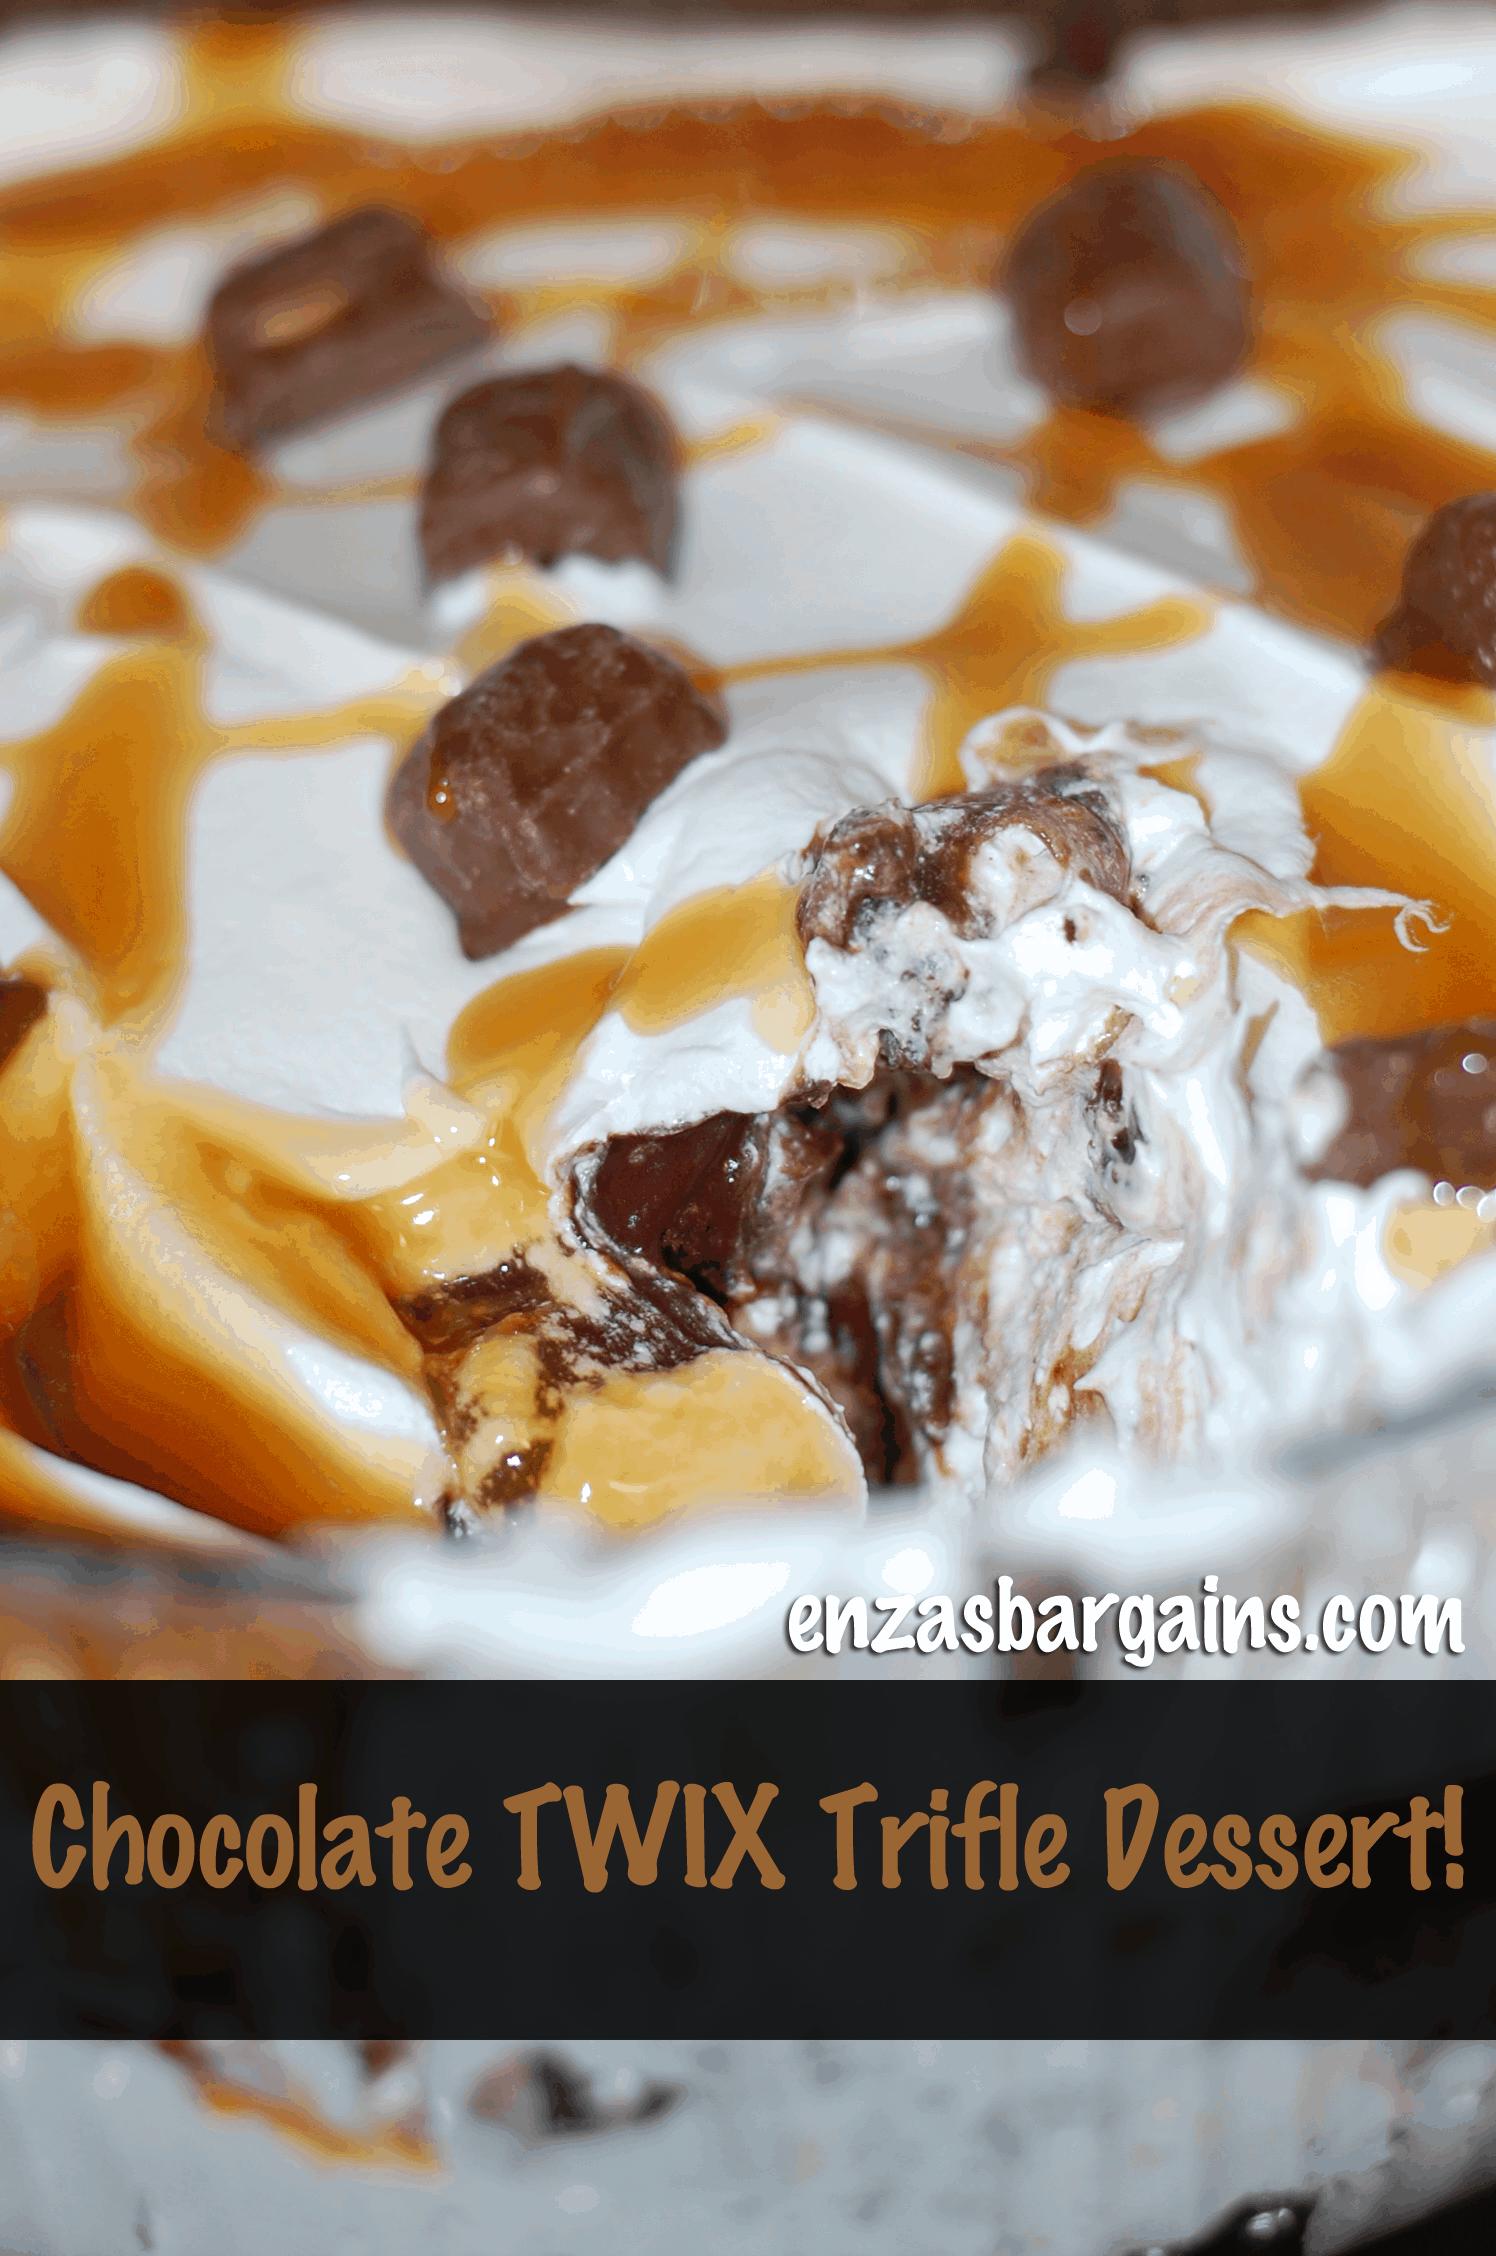 Twix Dessert Chocolate Trifle Dessert Made With TWIX Bites!